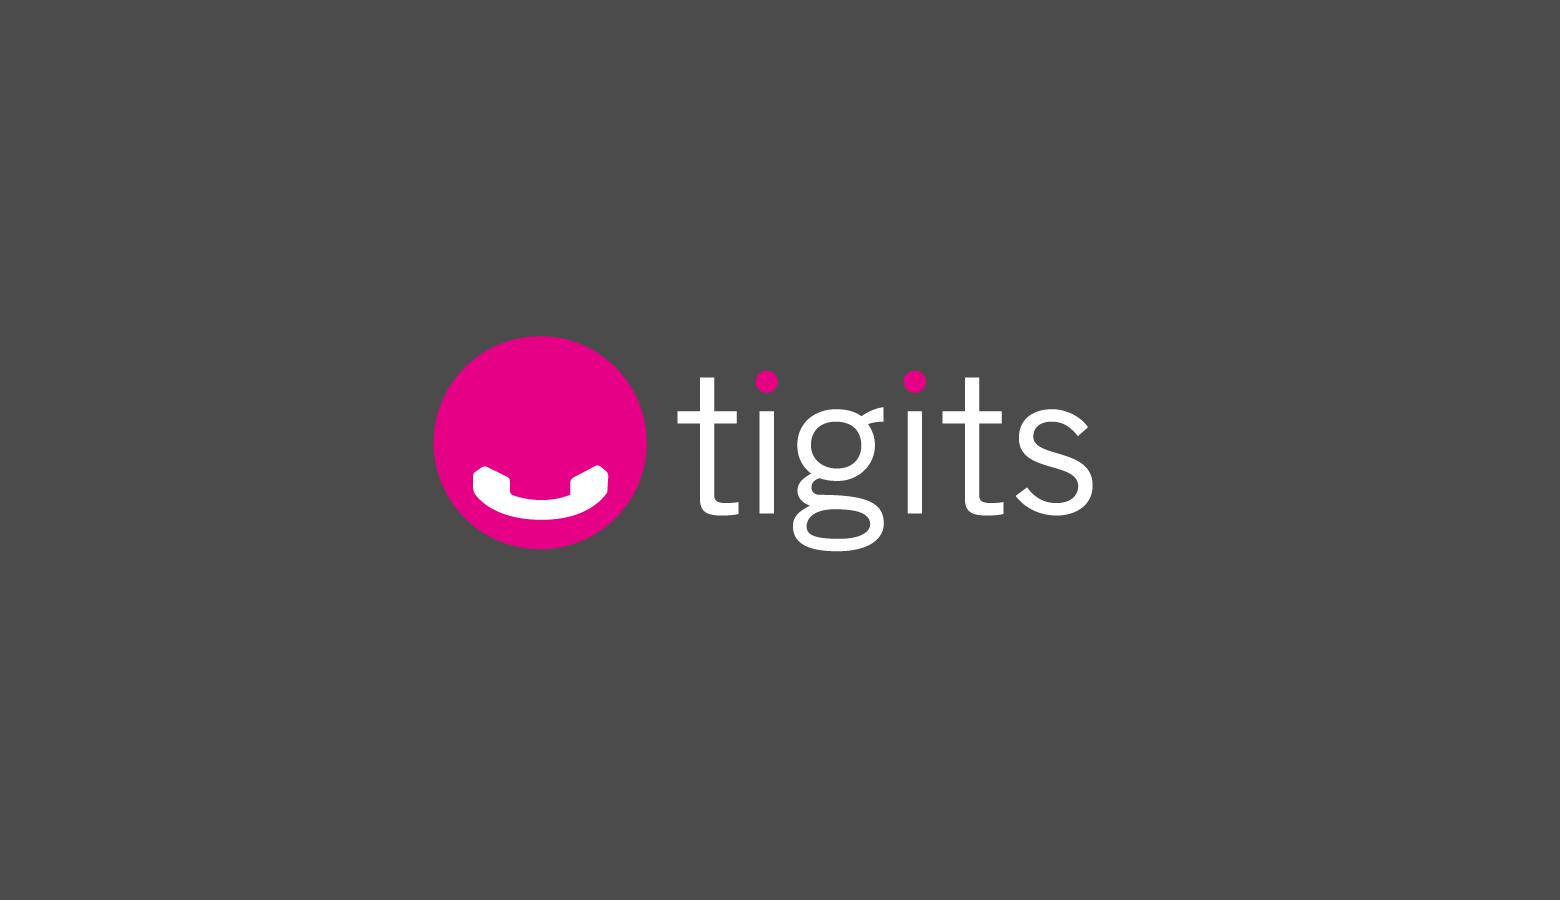 Tigits